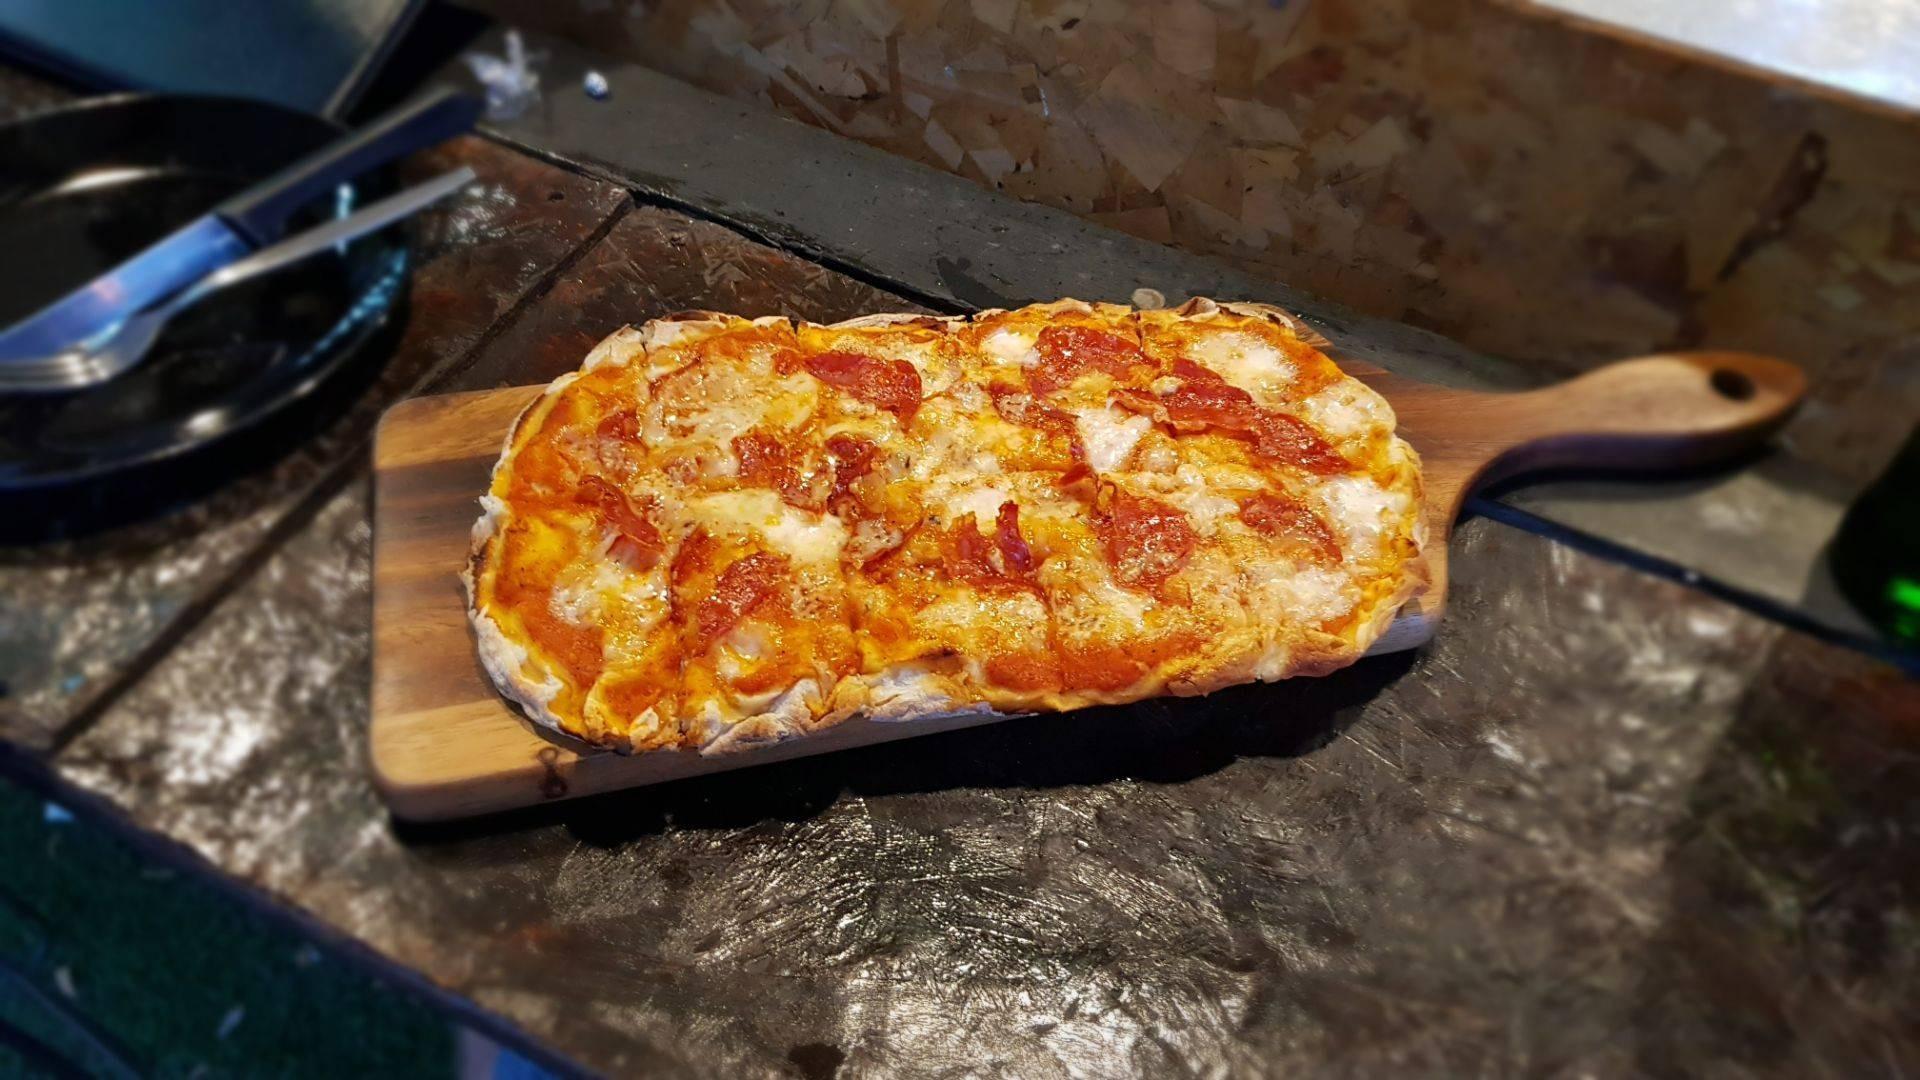 Love Boo's Pizza - อิตาเลียนพิซซ่าขอนแก่น